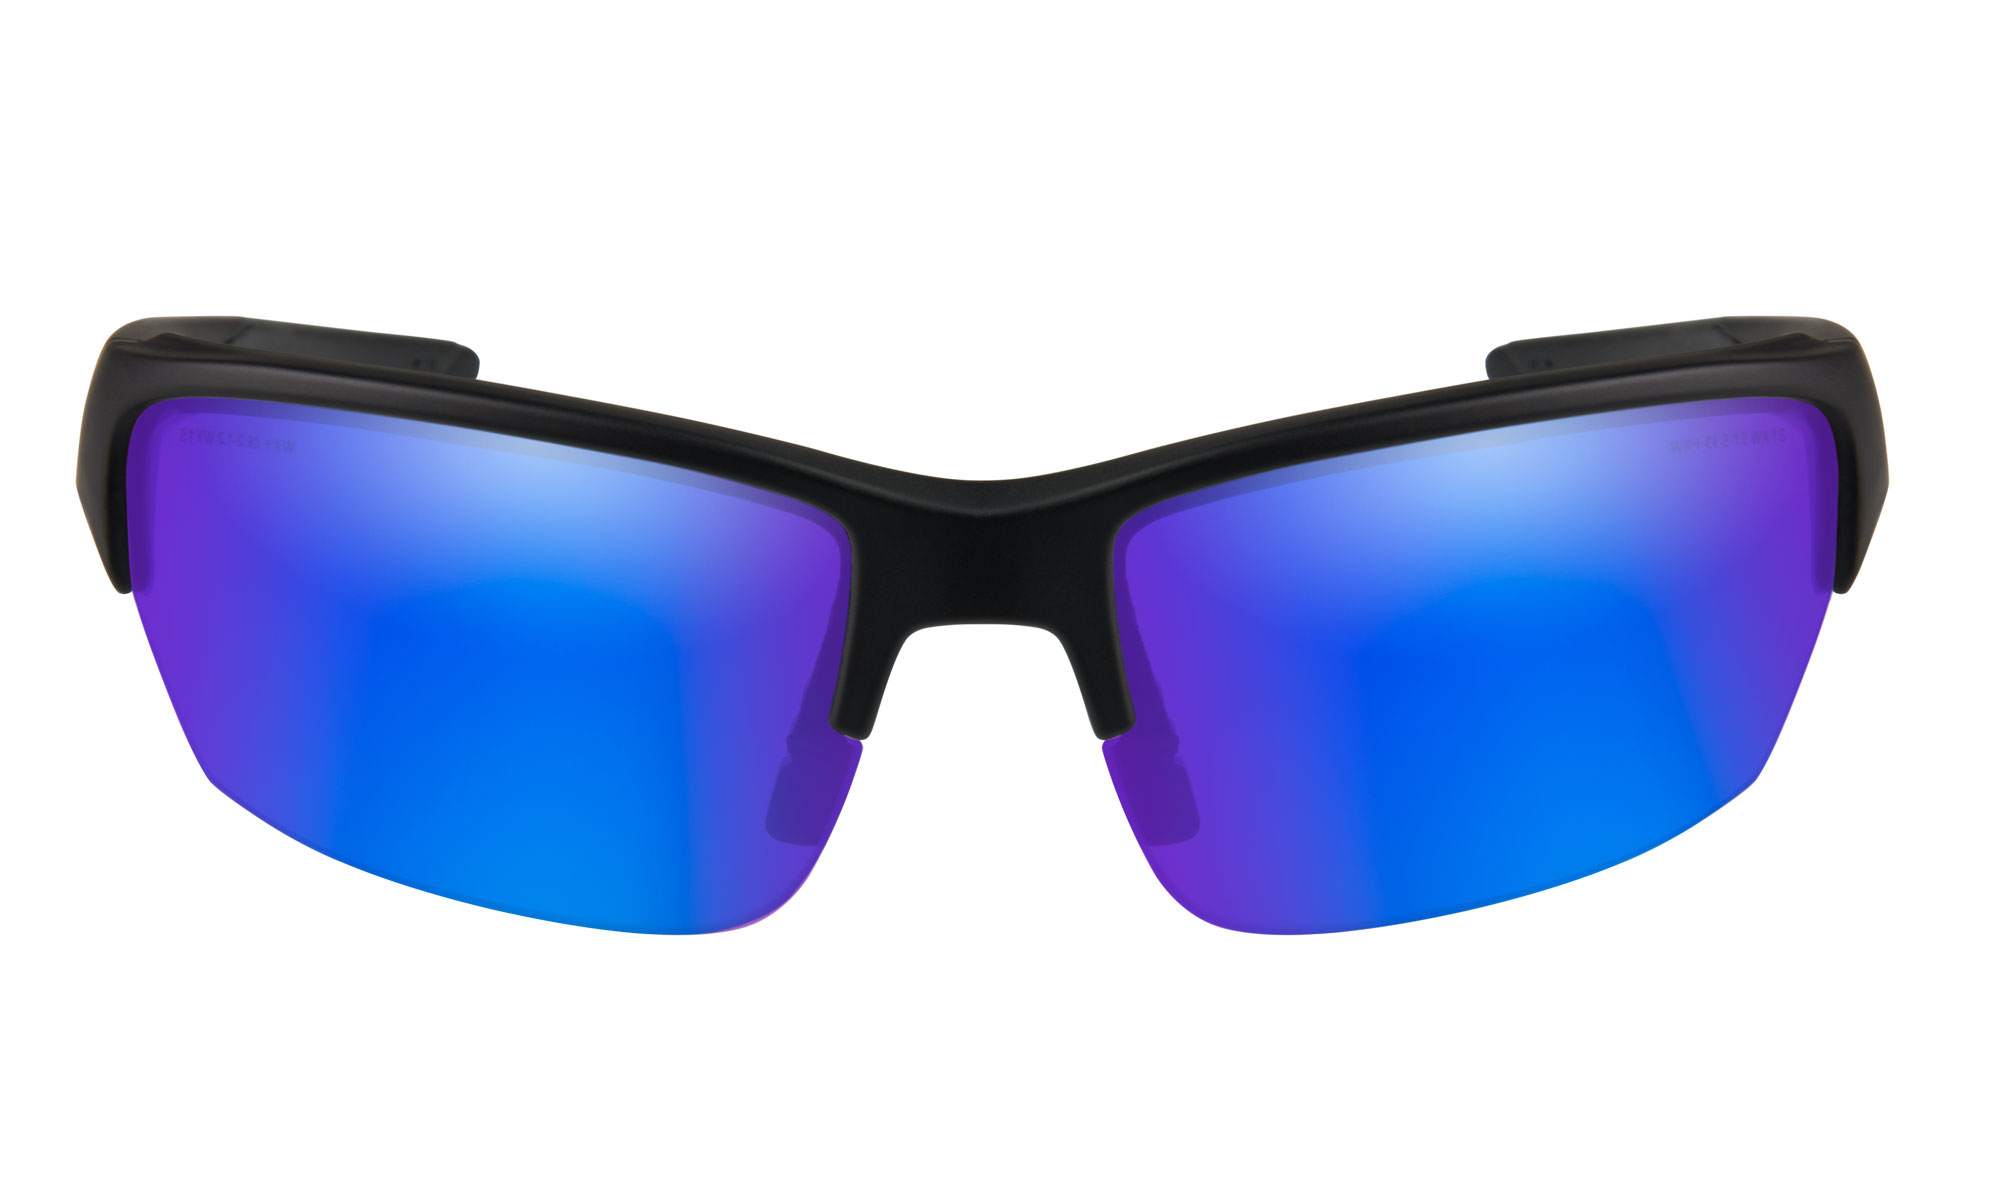 cdfb85d97609 Wiley-X WX Saint Matte Black with Polarized Blue Mirror Lenses